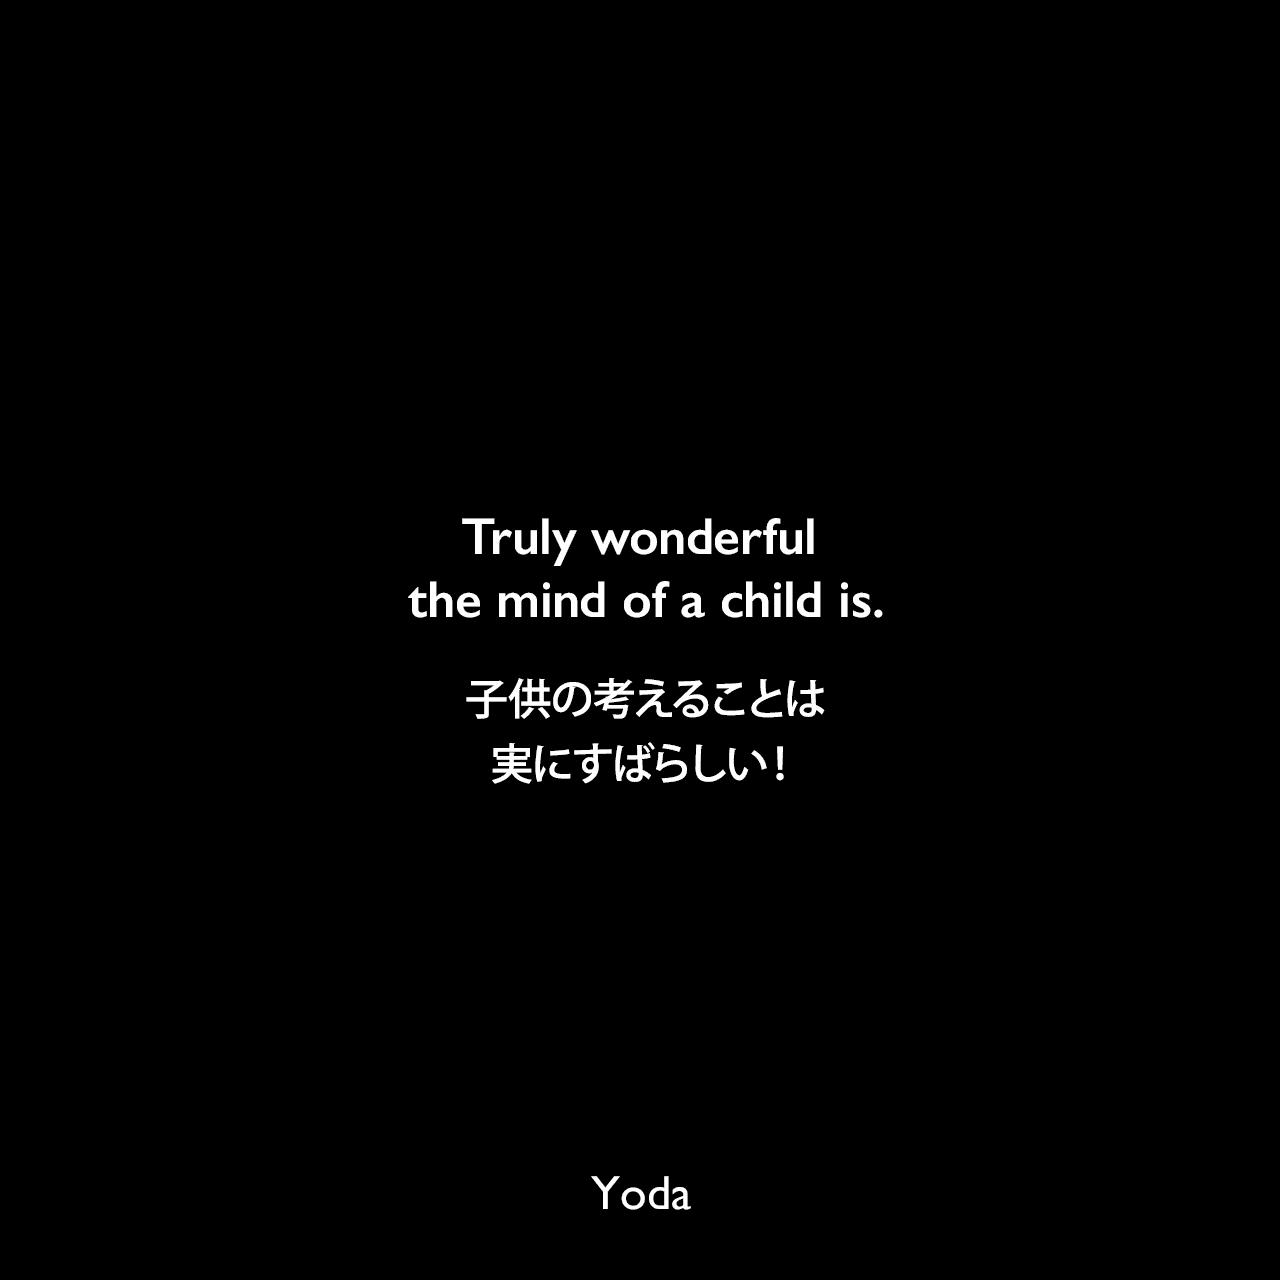 Truly wonderful the mind of a child is.子供の考えることは、実にすばらしい!- スター・ウォーズ エピソード2/クローンの攻撃Yoda